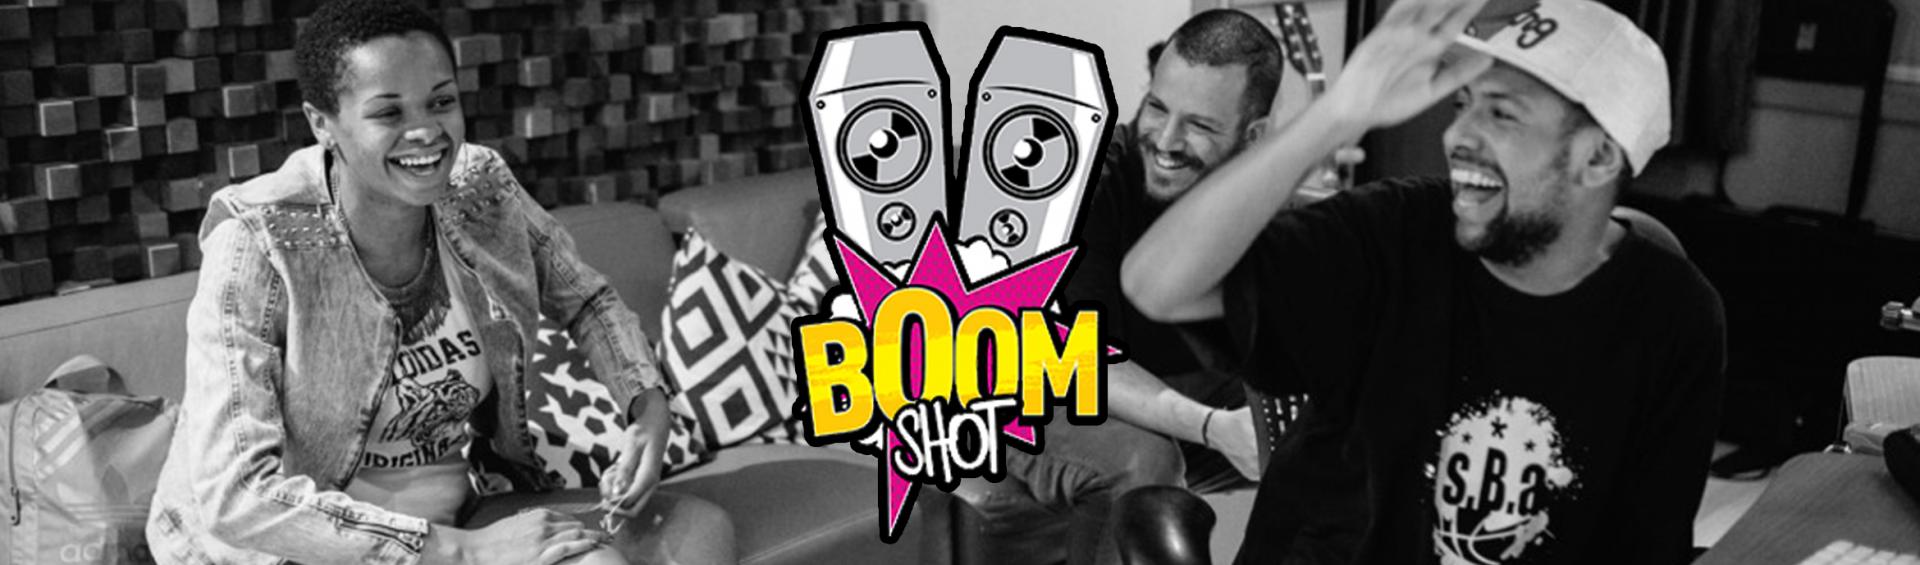 Radio Boomshot produtora de audio sp